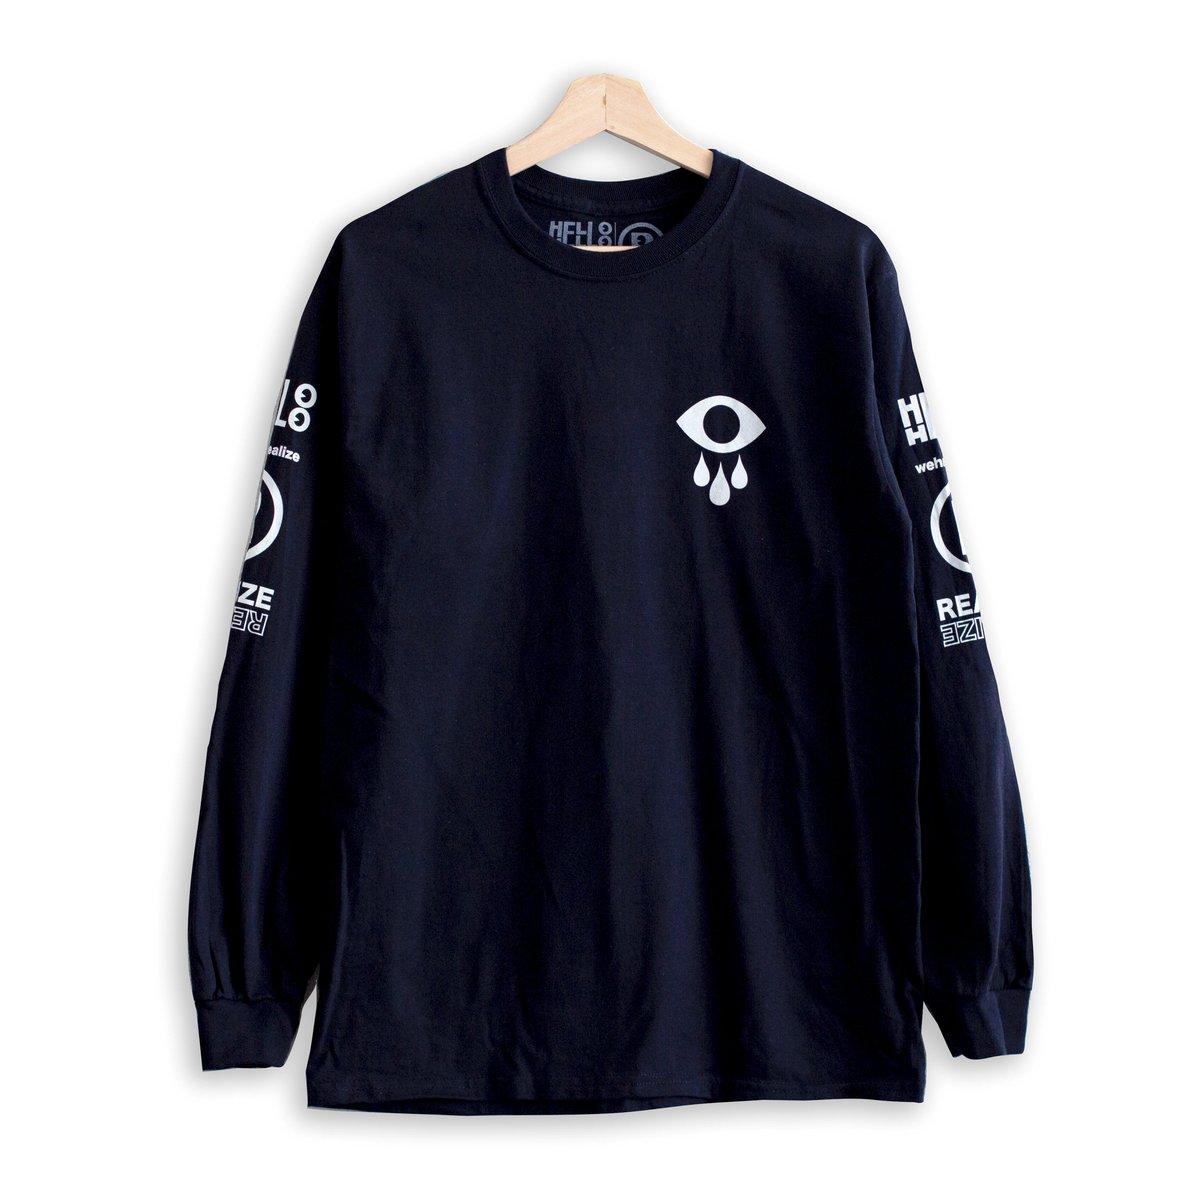 Image of Hello Long Sleeve Shirt